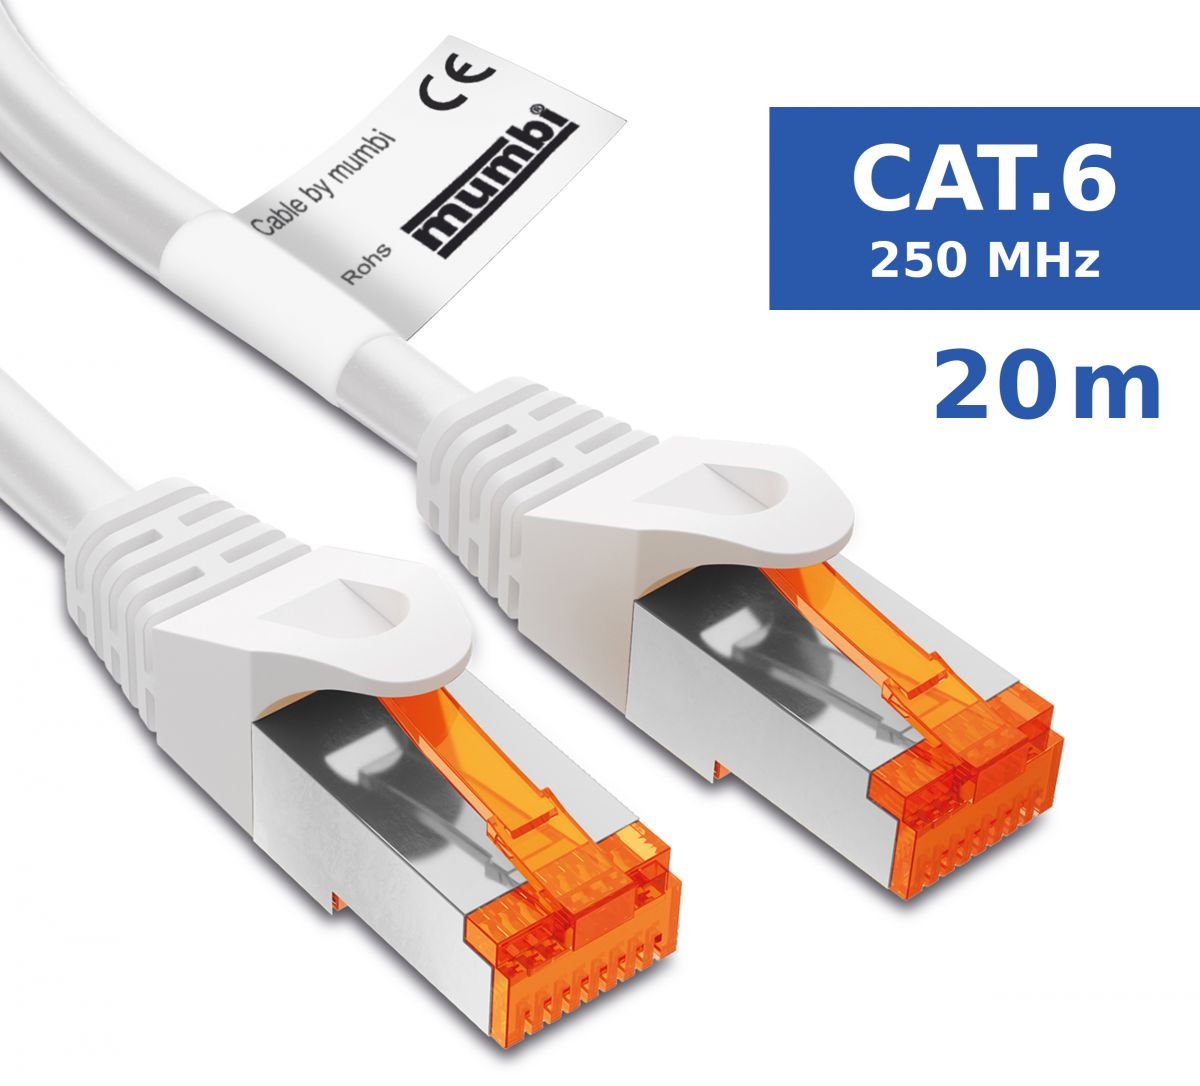 mumbi 20m cat6 netzwerkkabel patchkabel ethernet kabel lan dsl weiss ebay. Black Bedroom Furniture Sets. Home Design Ideas